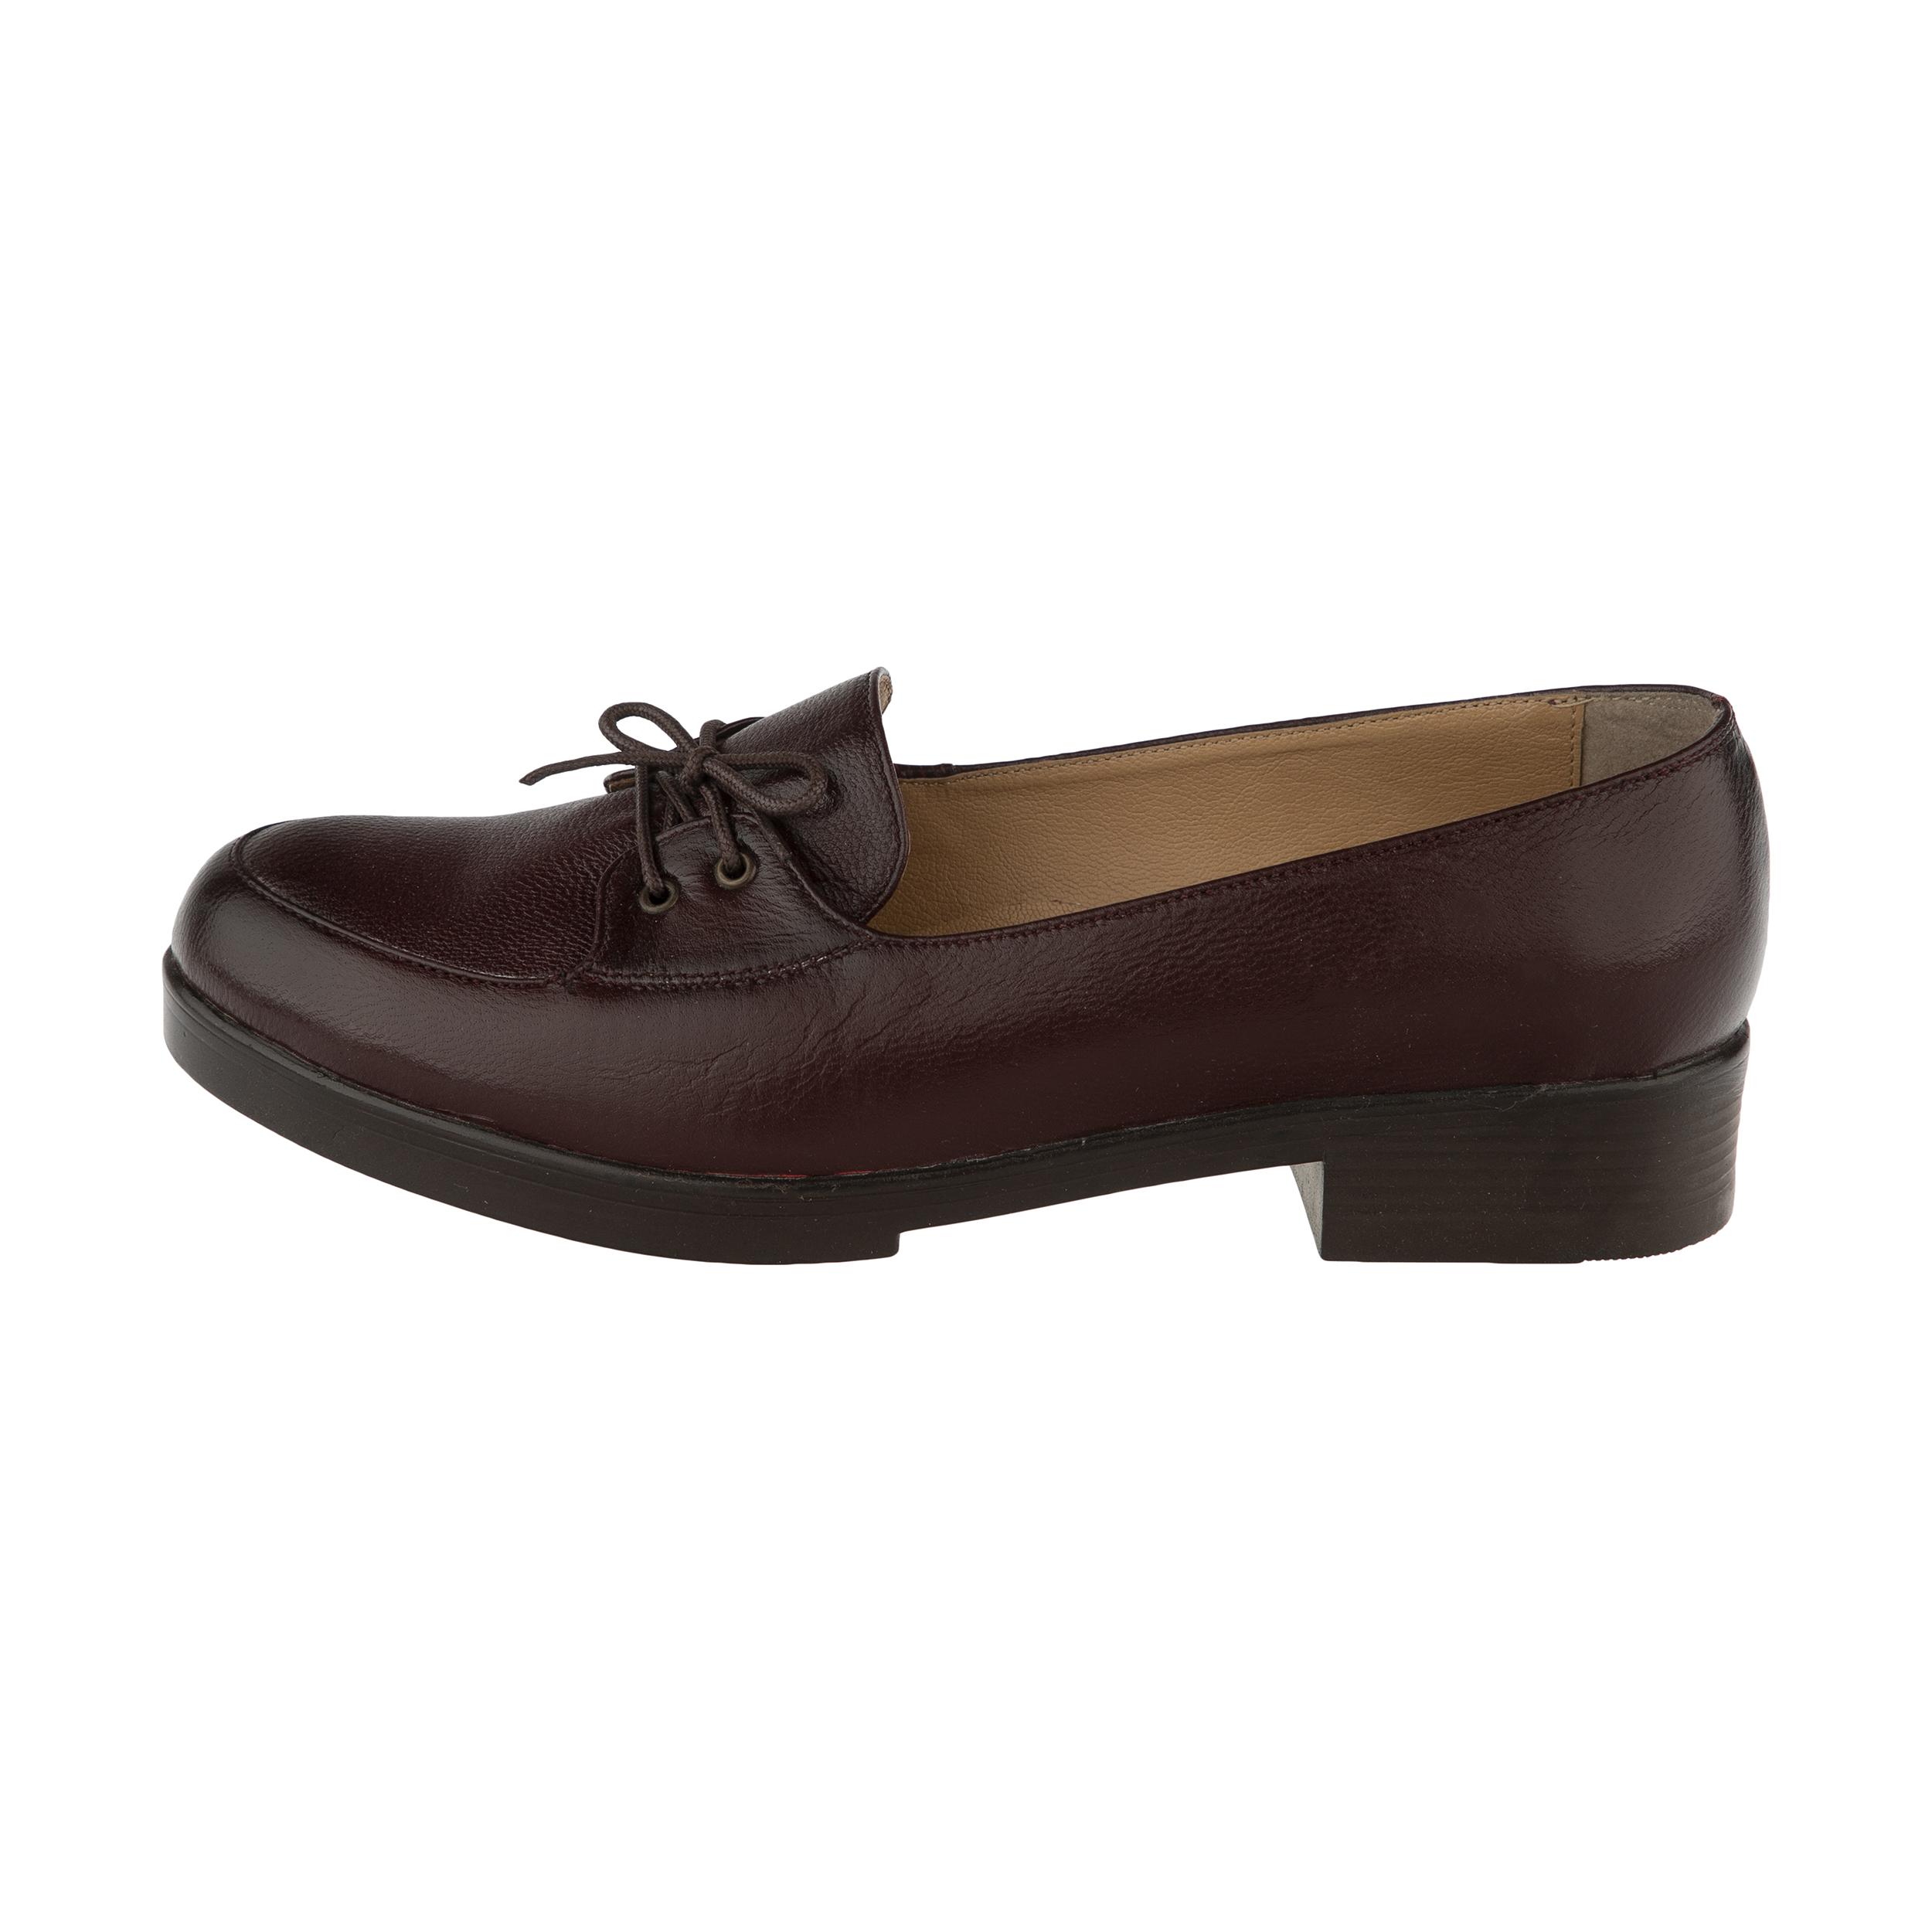 کفش روزمره زنانه ساتین مدل 5m11a500110